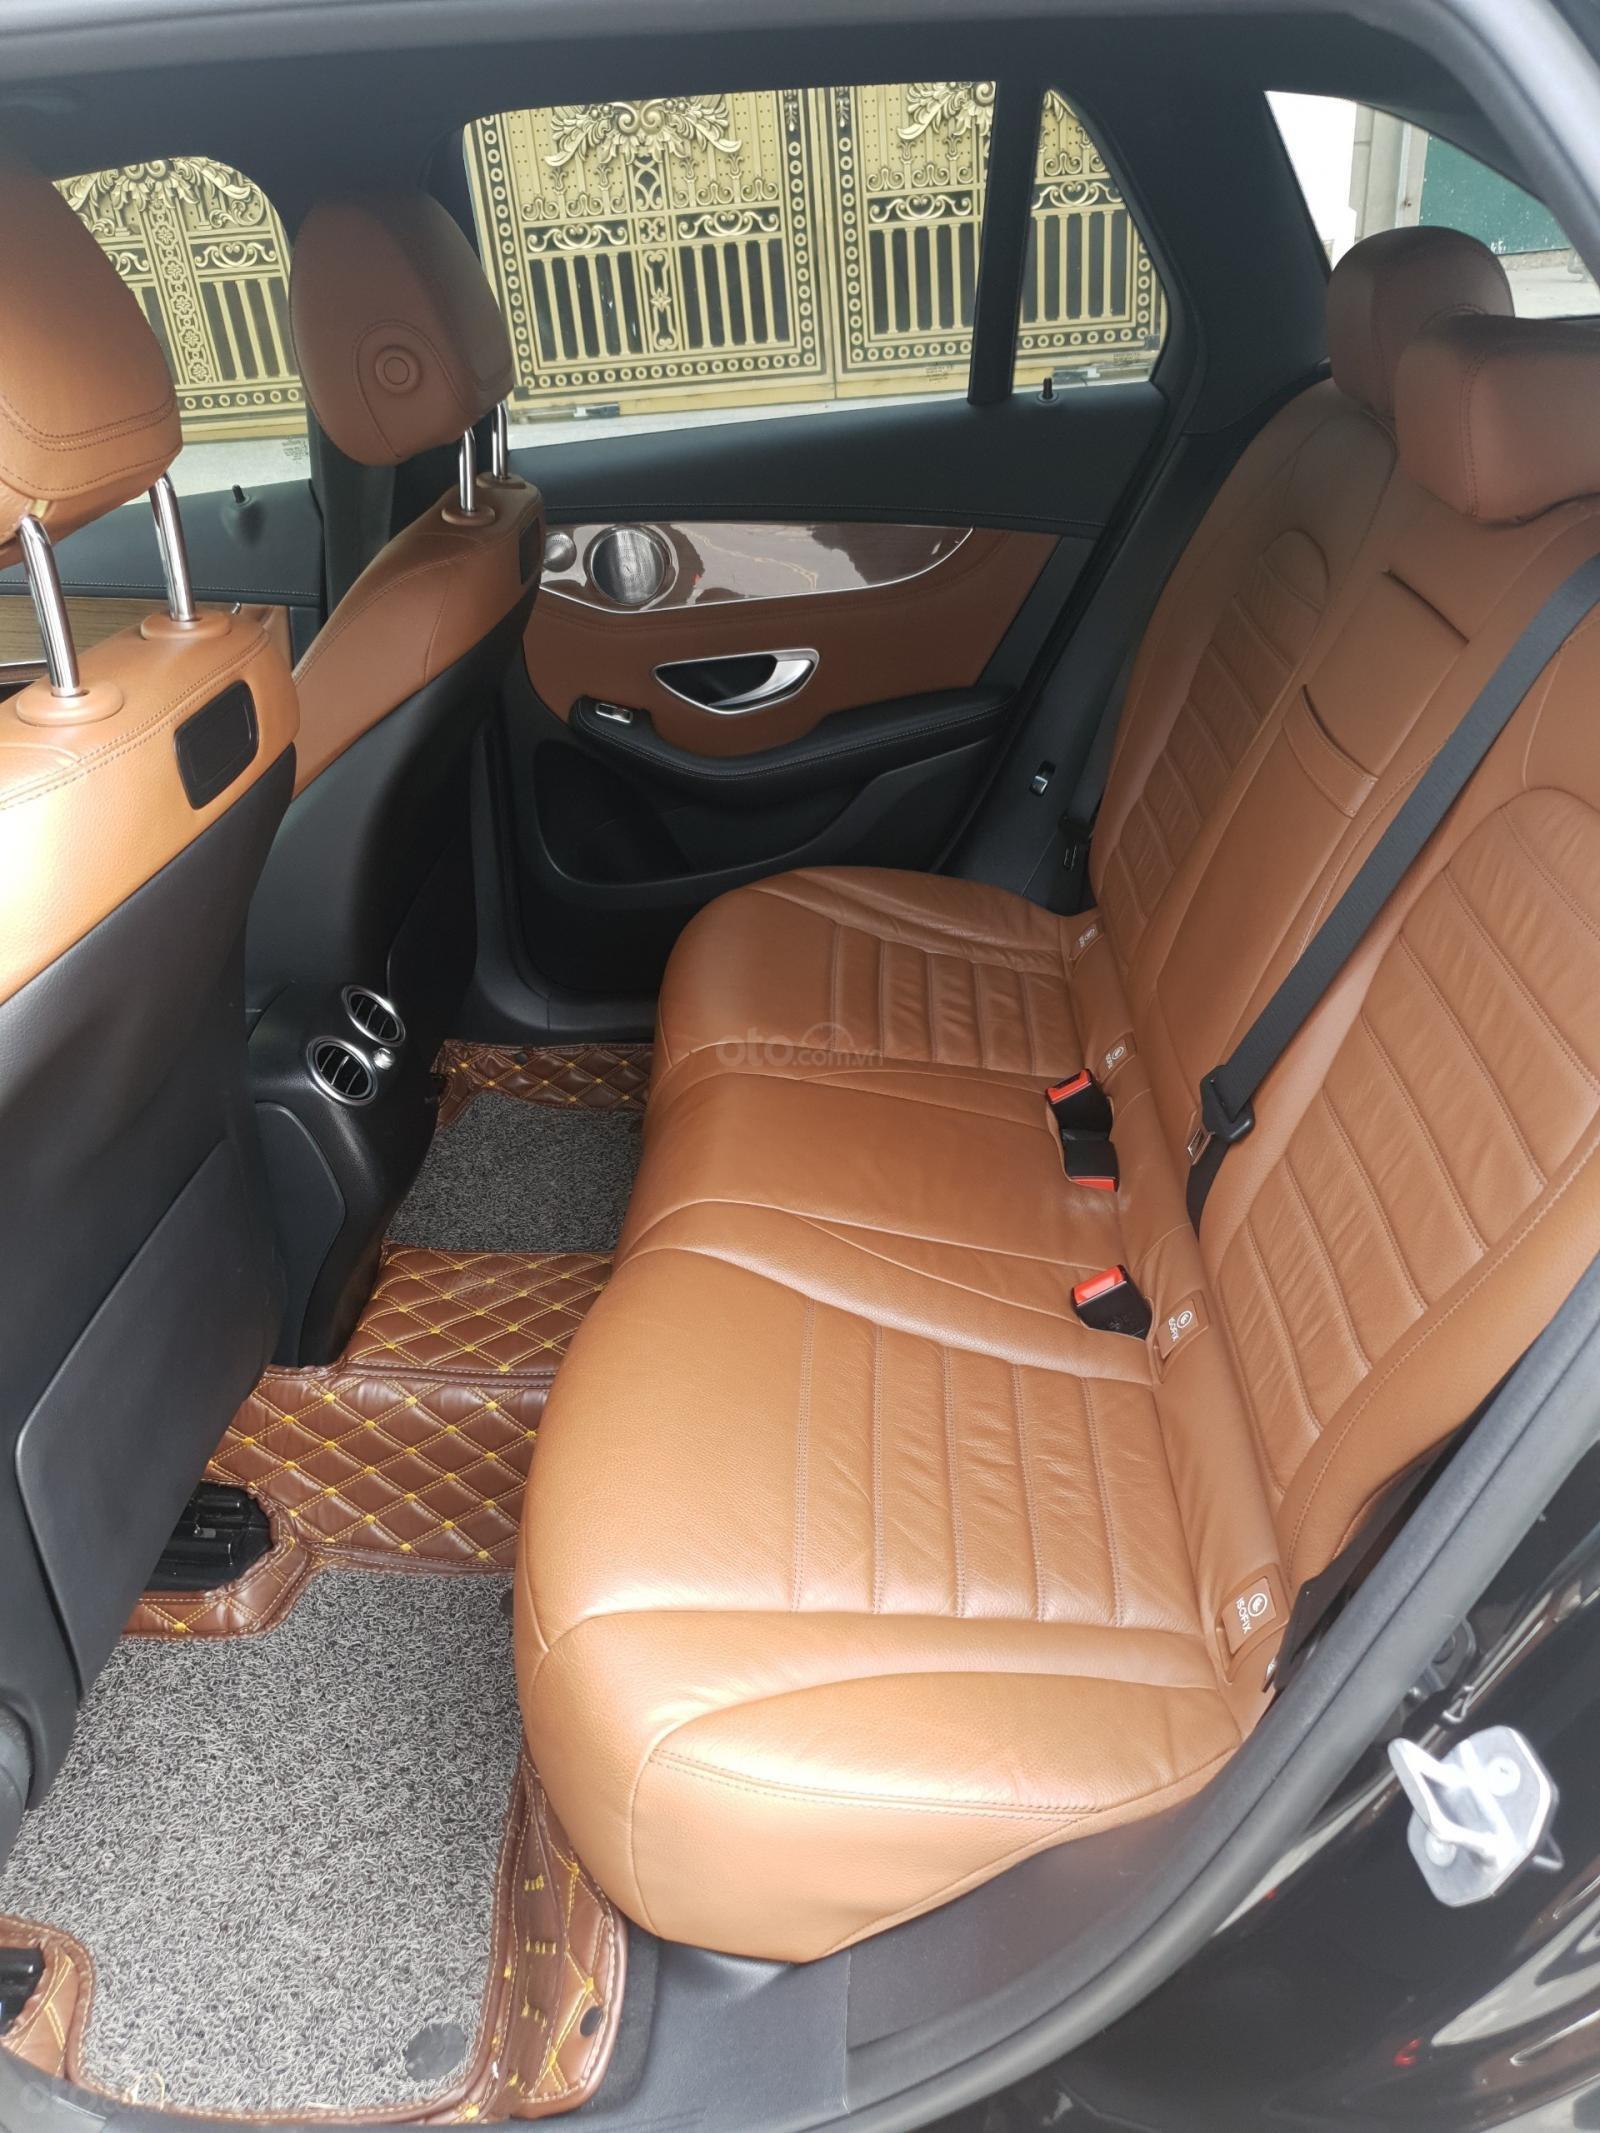 Bán Mercedes Benz GLC 250 đen nâu 2018 (8)